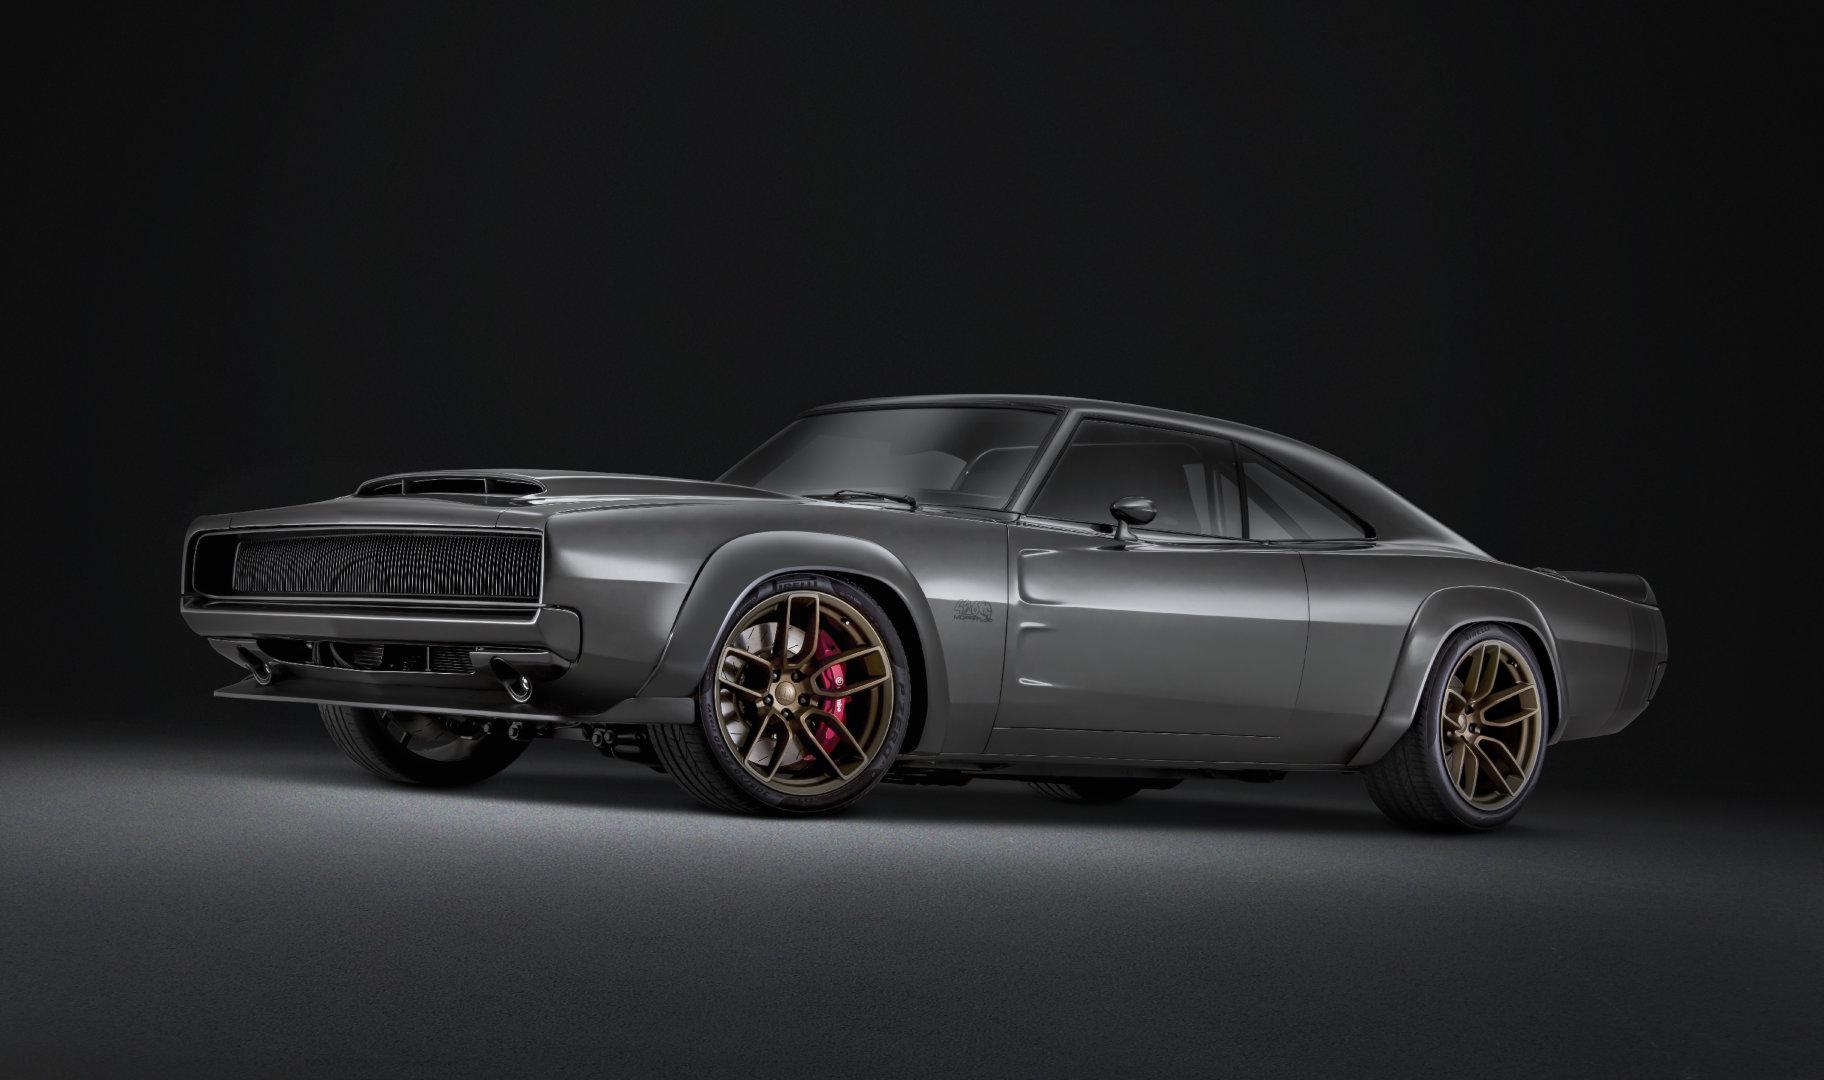 Mopar presenta el Dodge Super Charger con 1.000 CV